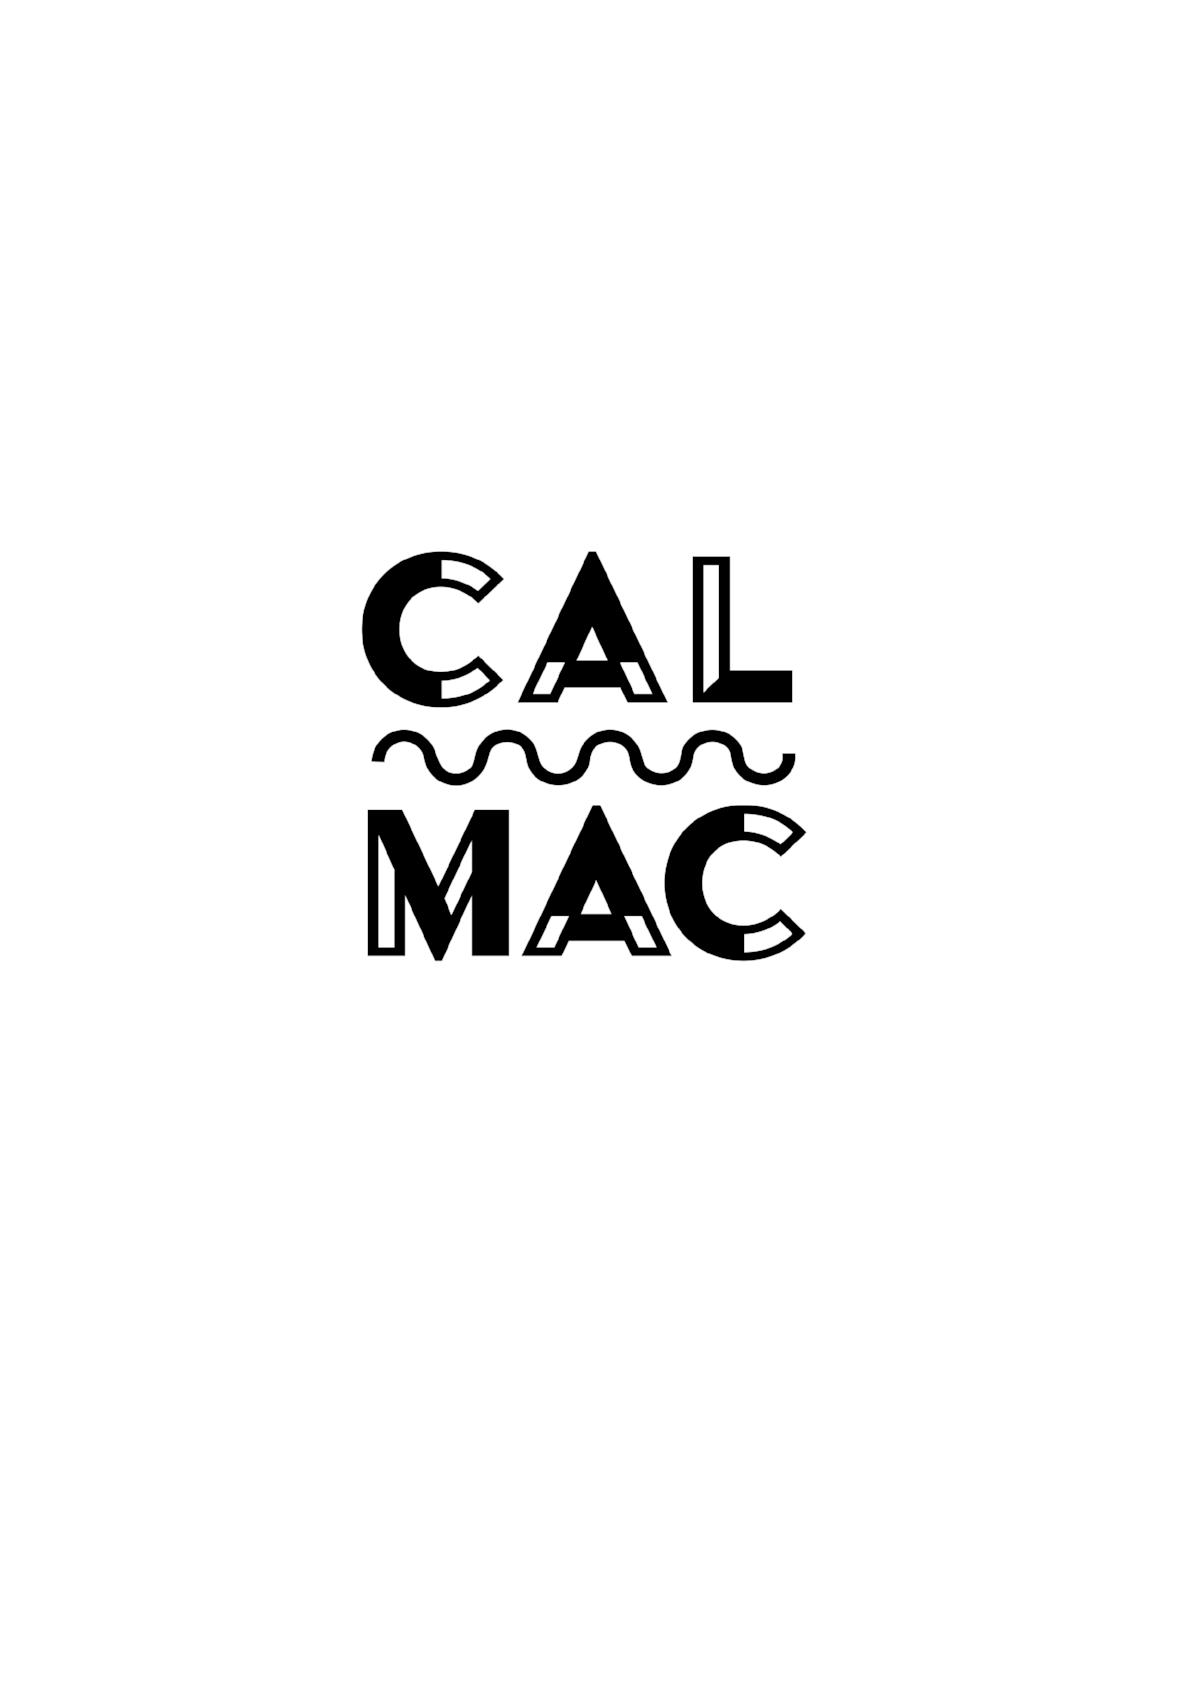 calmac.png